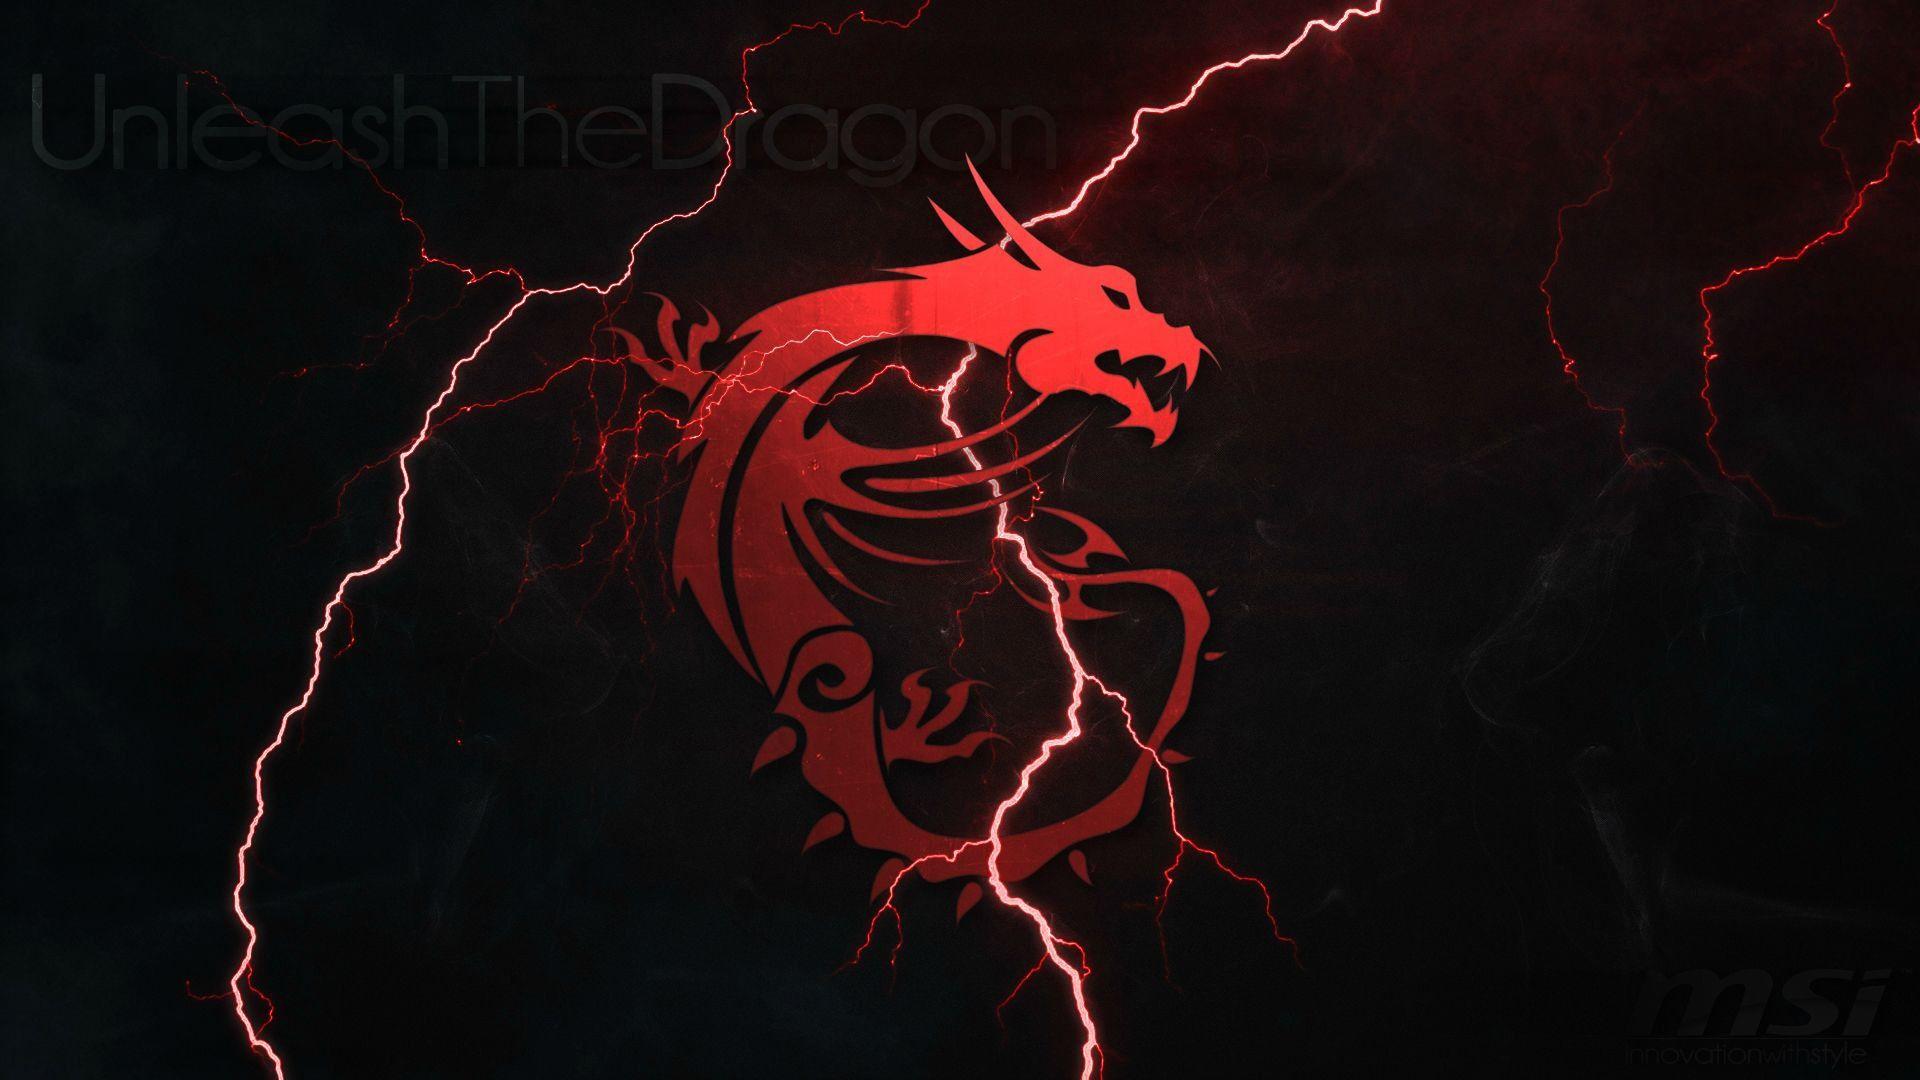 Black Dragon Hd Wallpaper Wallpapers Kid 1920×1080 Dragon HD